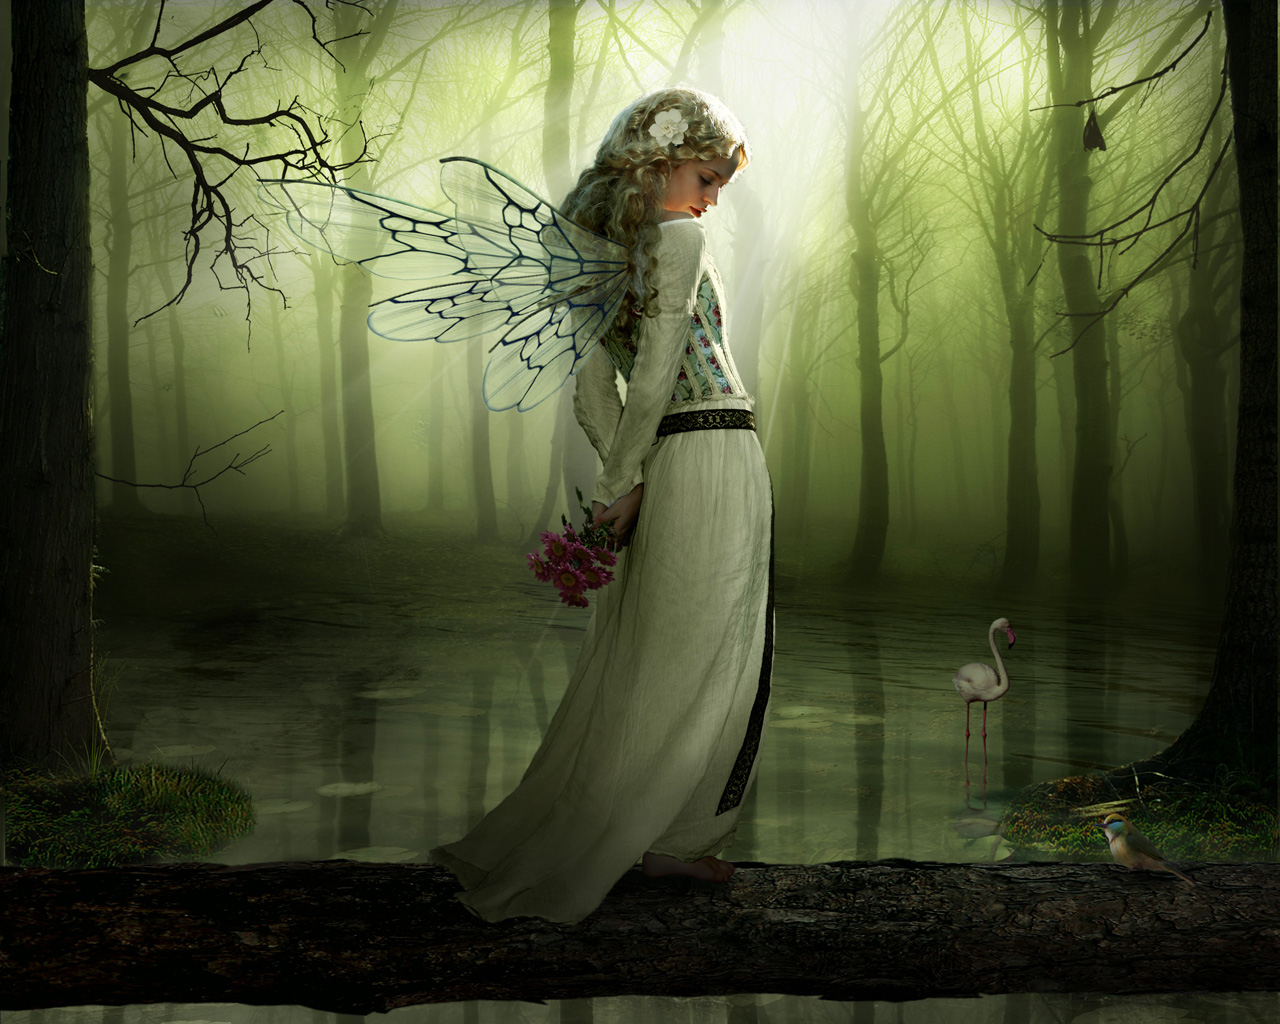 http://1.bp.blogspot.com/_HzAThb2RgMc/TLxhKikATsI/AAAAAAAABnk/3DSpeAc_Sus/s1600/Green_Fairy_WP_by_Pygar.jpg